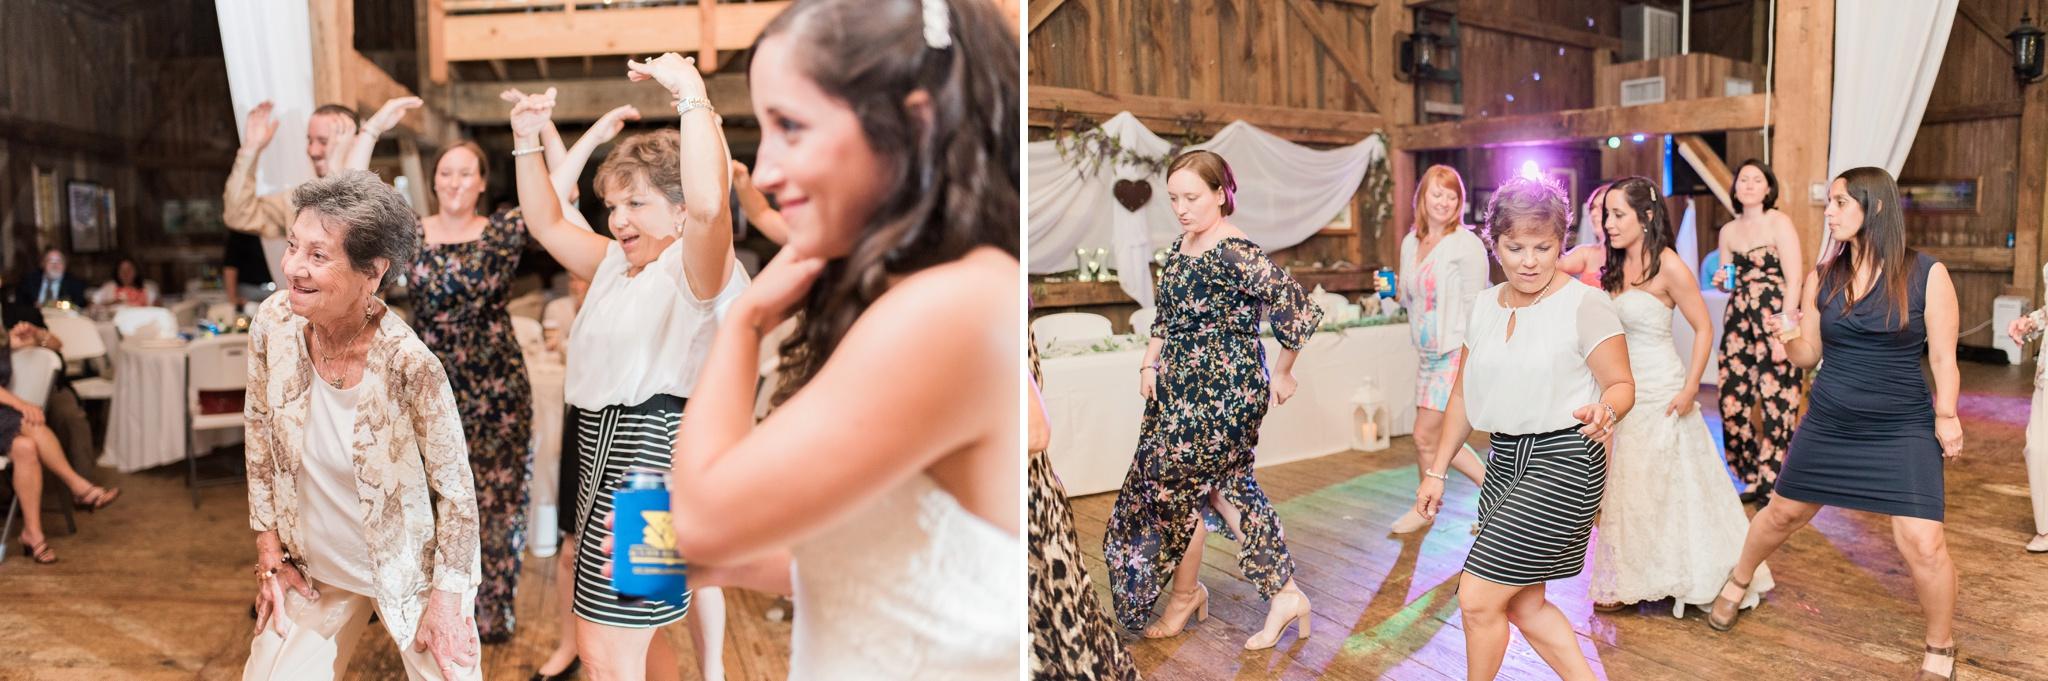 niederman-farm-wedding-cincinnati-ohio-photographer_0106.jpg